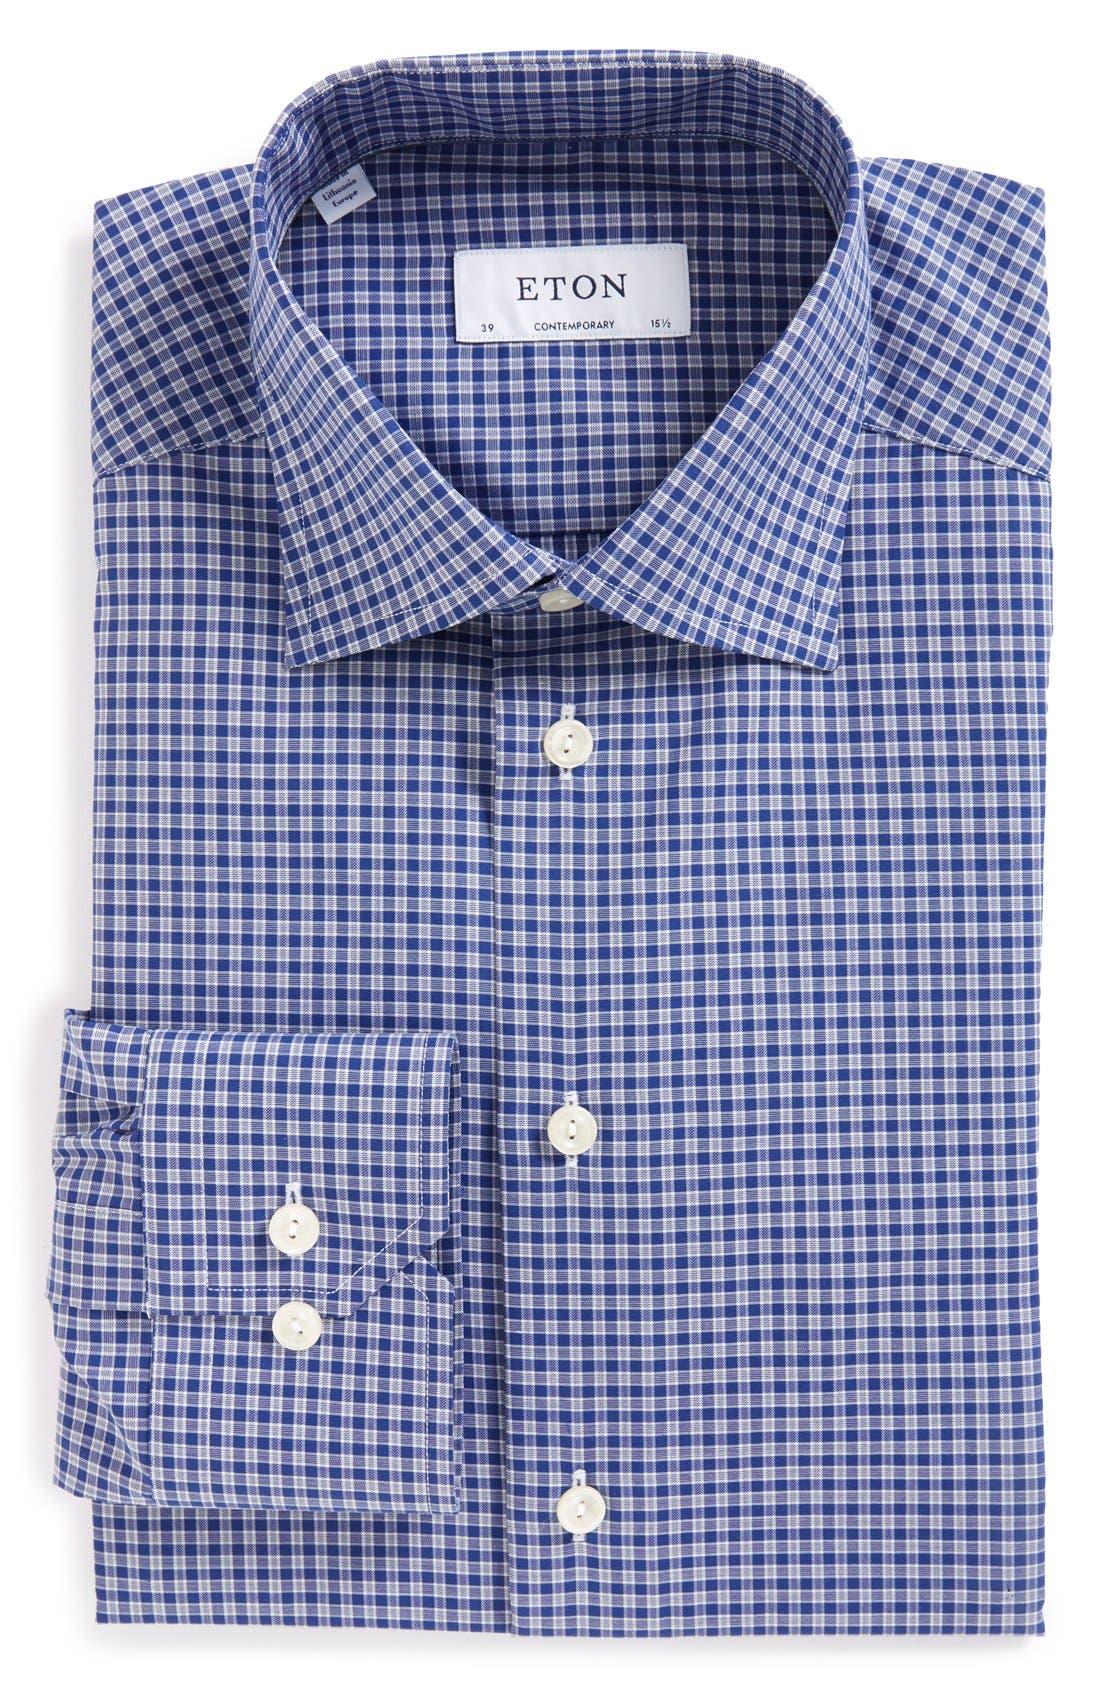 Main Image - Eton Contemporary Fit Check Dress Shirt